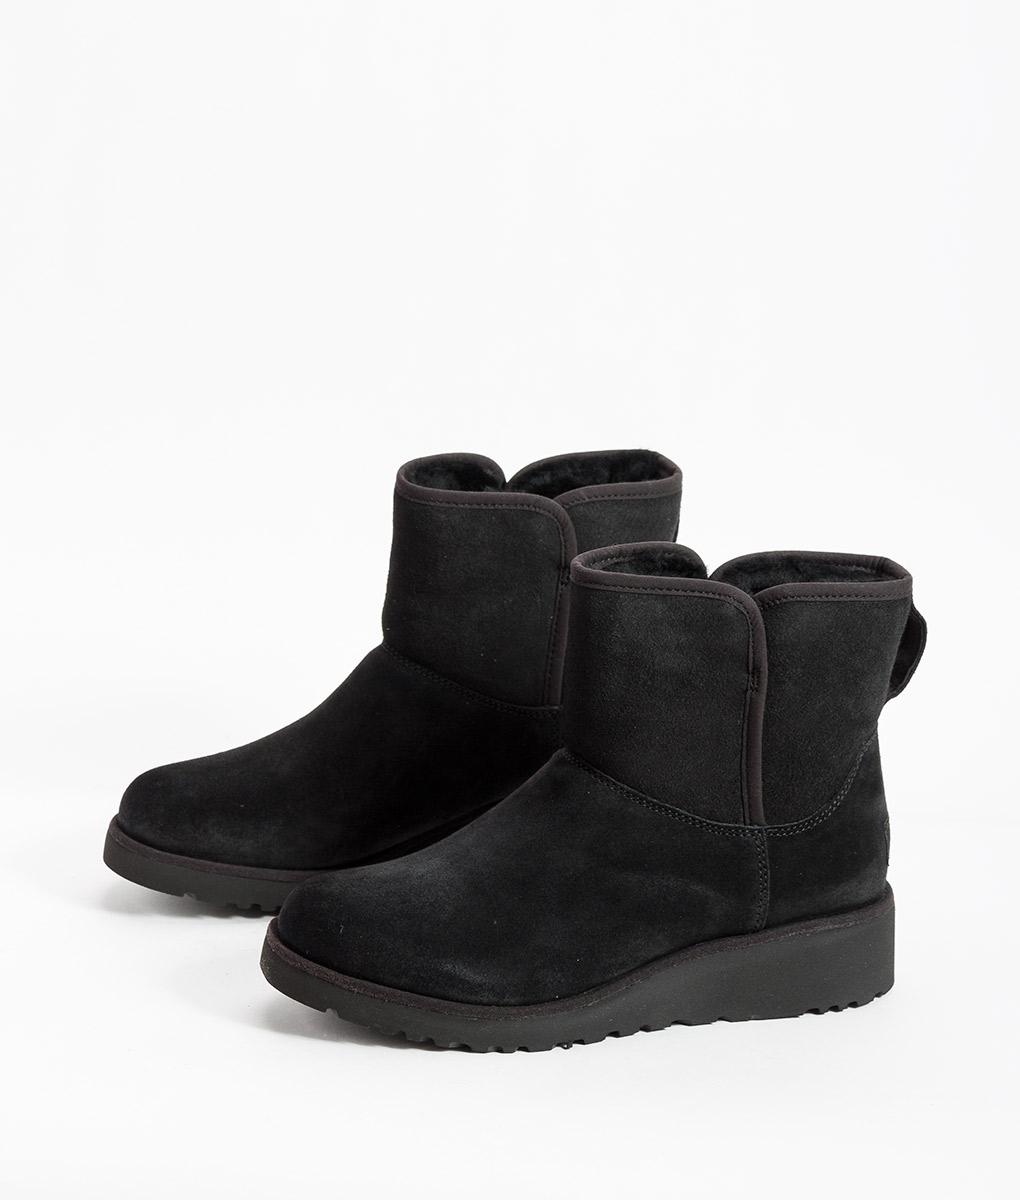 UGG Women Ankle Boots KRISTIN, Black 234.99 2